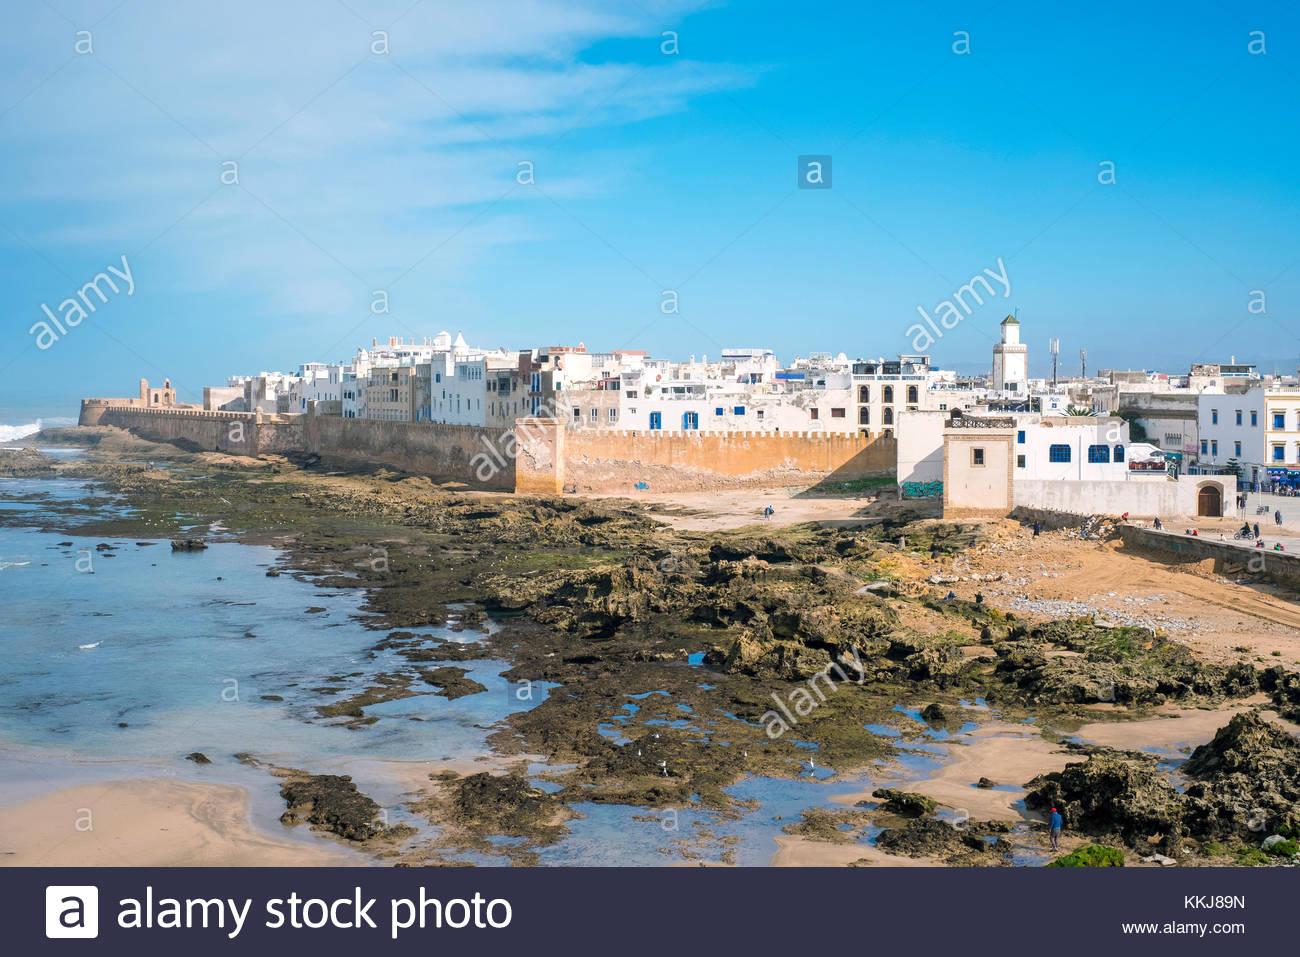 Marruecos, Marrakesh-Safi (Marrakesh-Tensift-El Haouz) Región, Essaouira. Medina, casco antiguo de la ciudad, Imagen De Stock